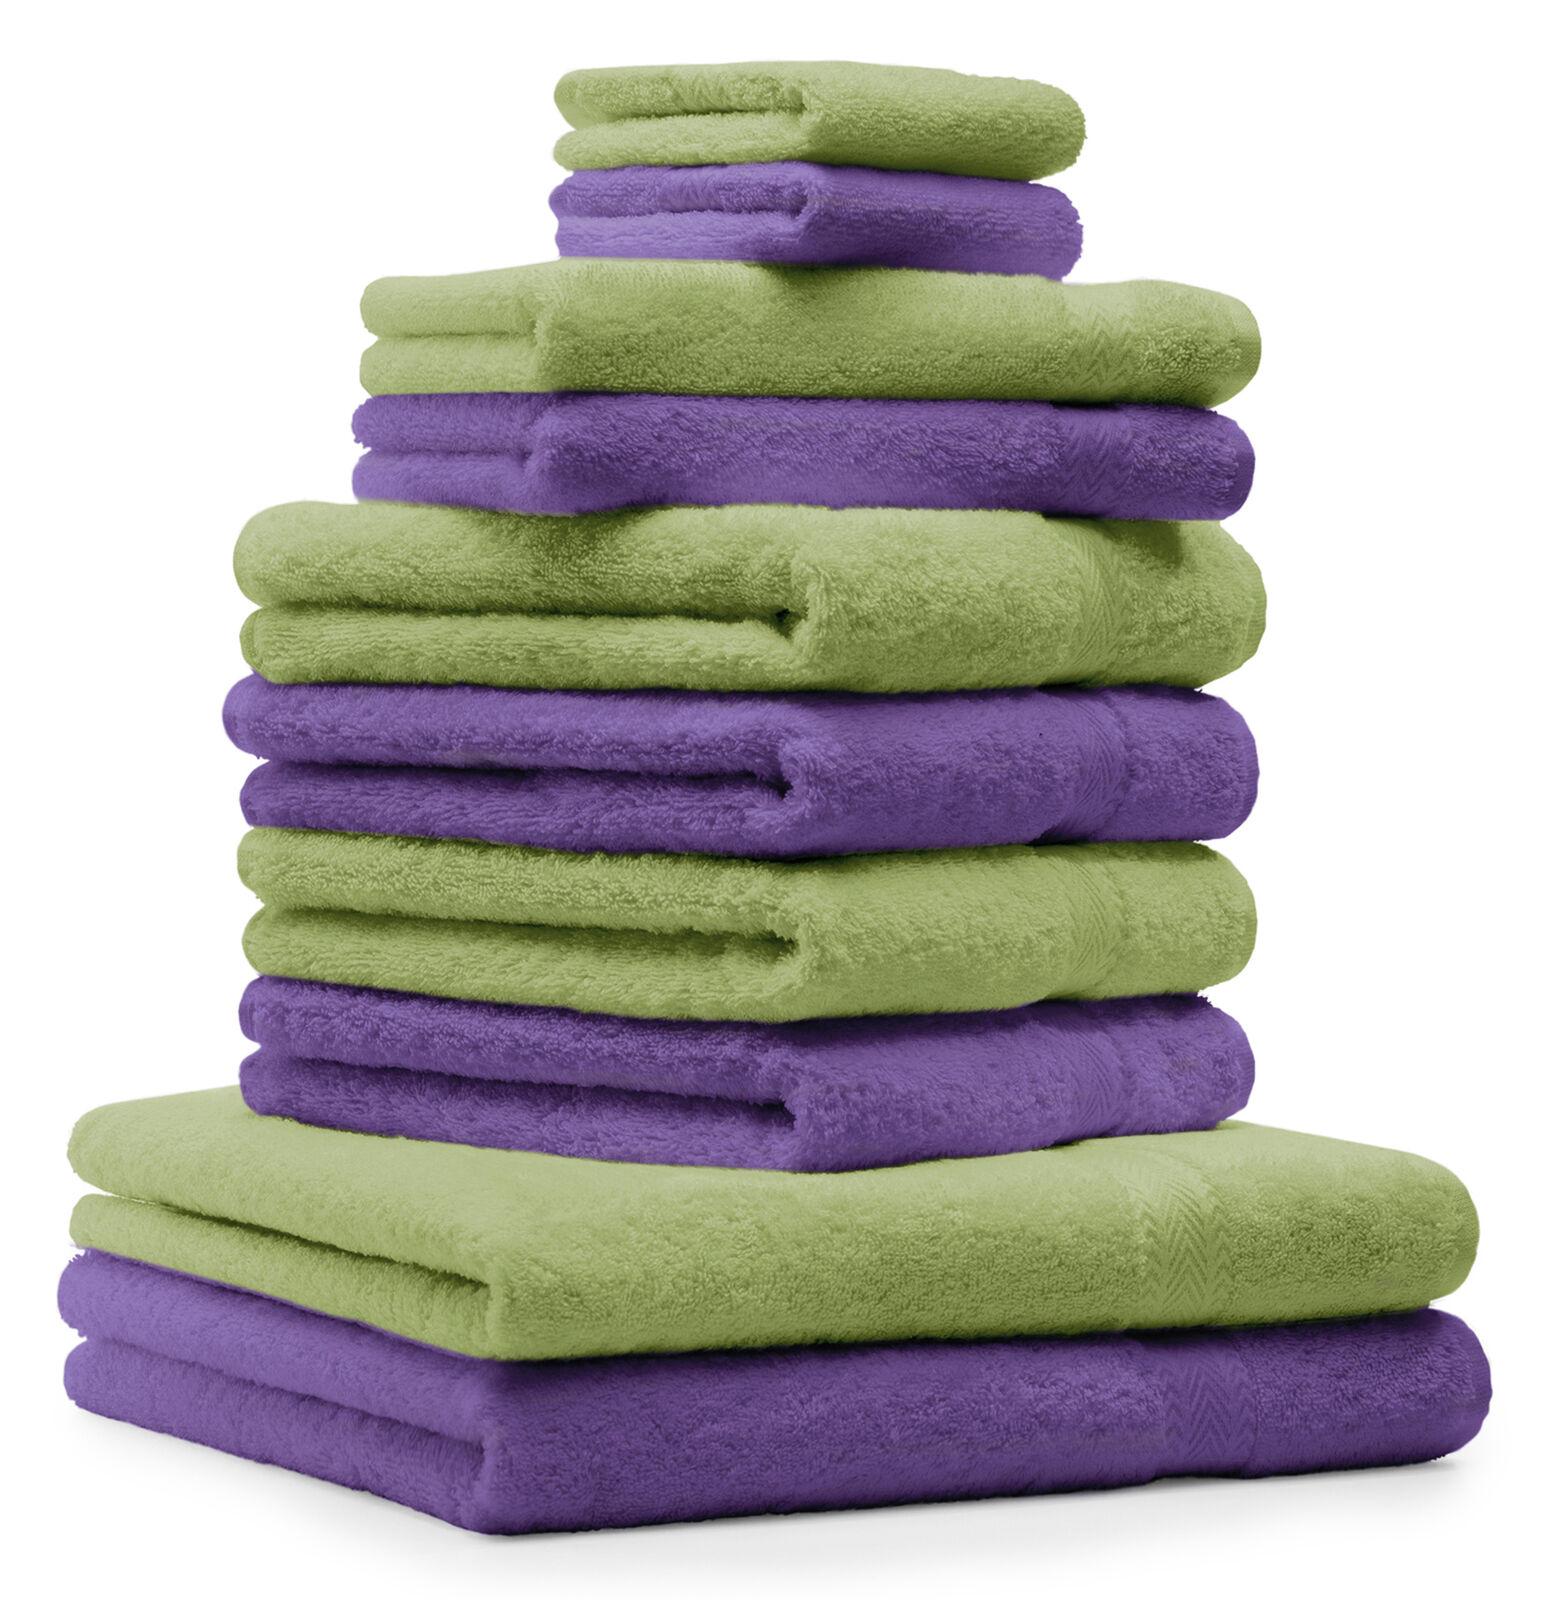 Betz 10-tlg. Handtuch Set Classic Farbe Apfel-Grün & Lila     | Kompletter Spezifikationsbereich